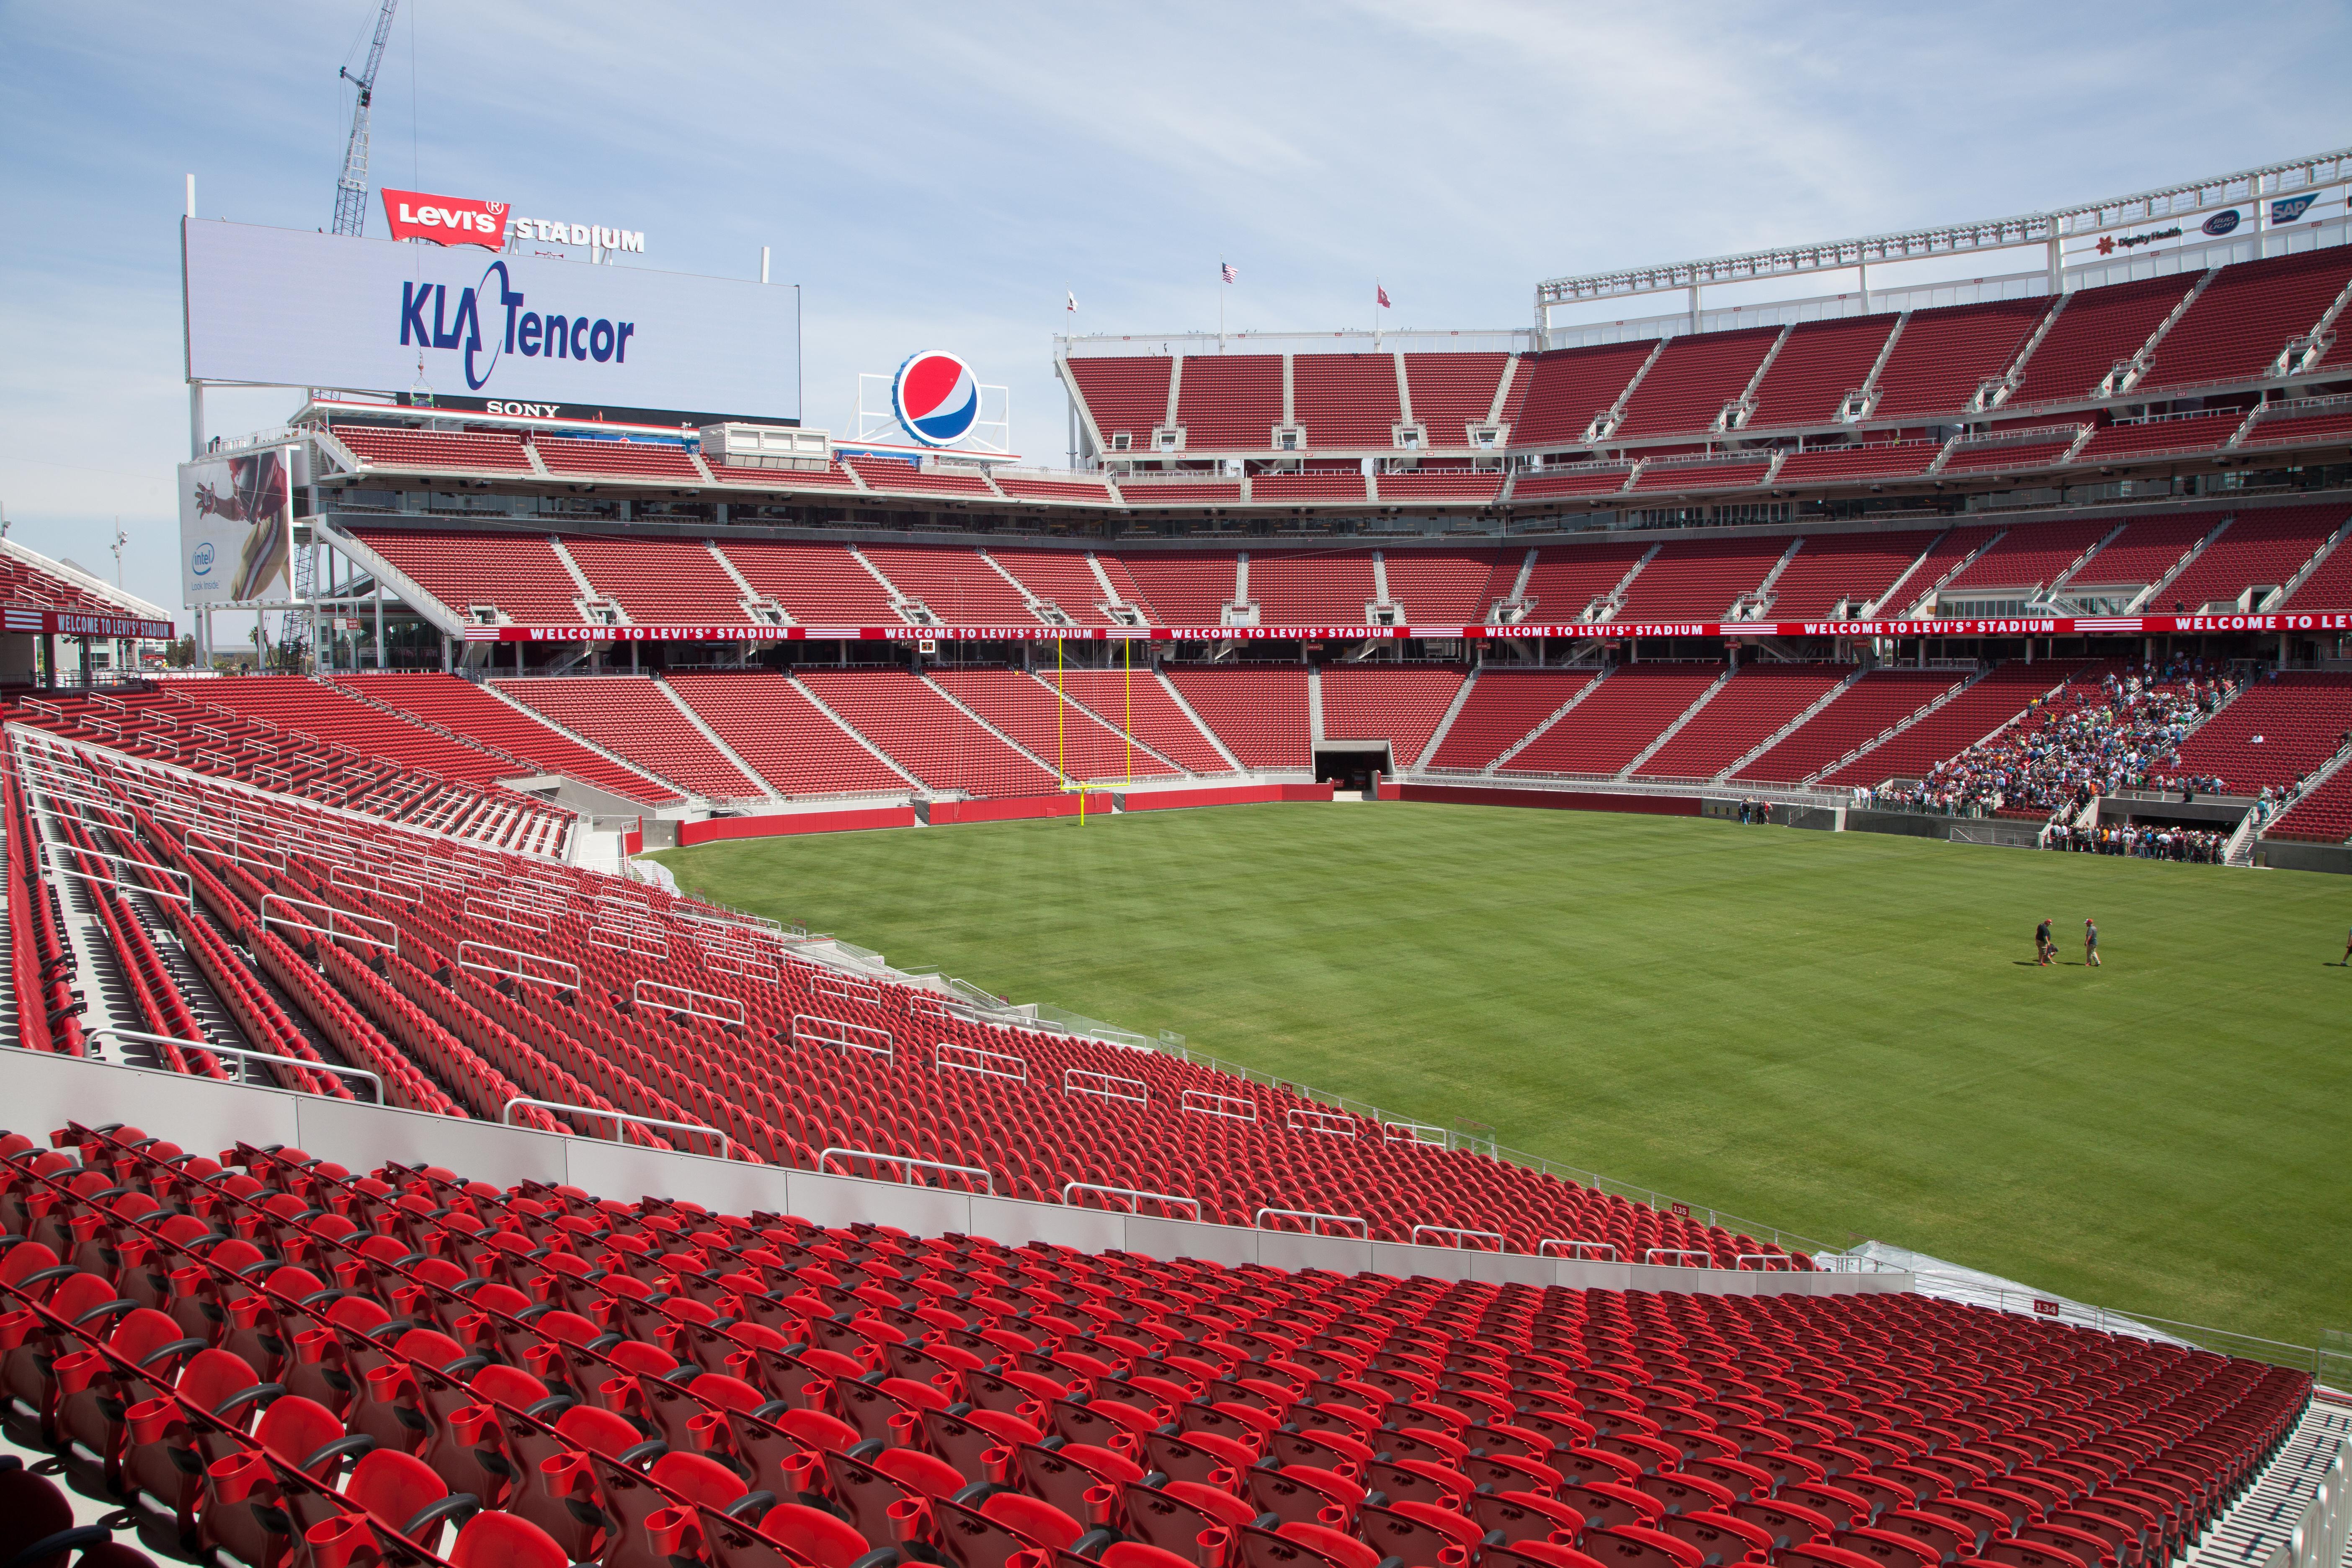 file:levi's stadium interior 1 - wikimedia commons